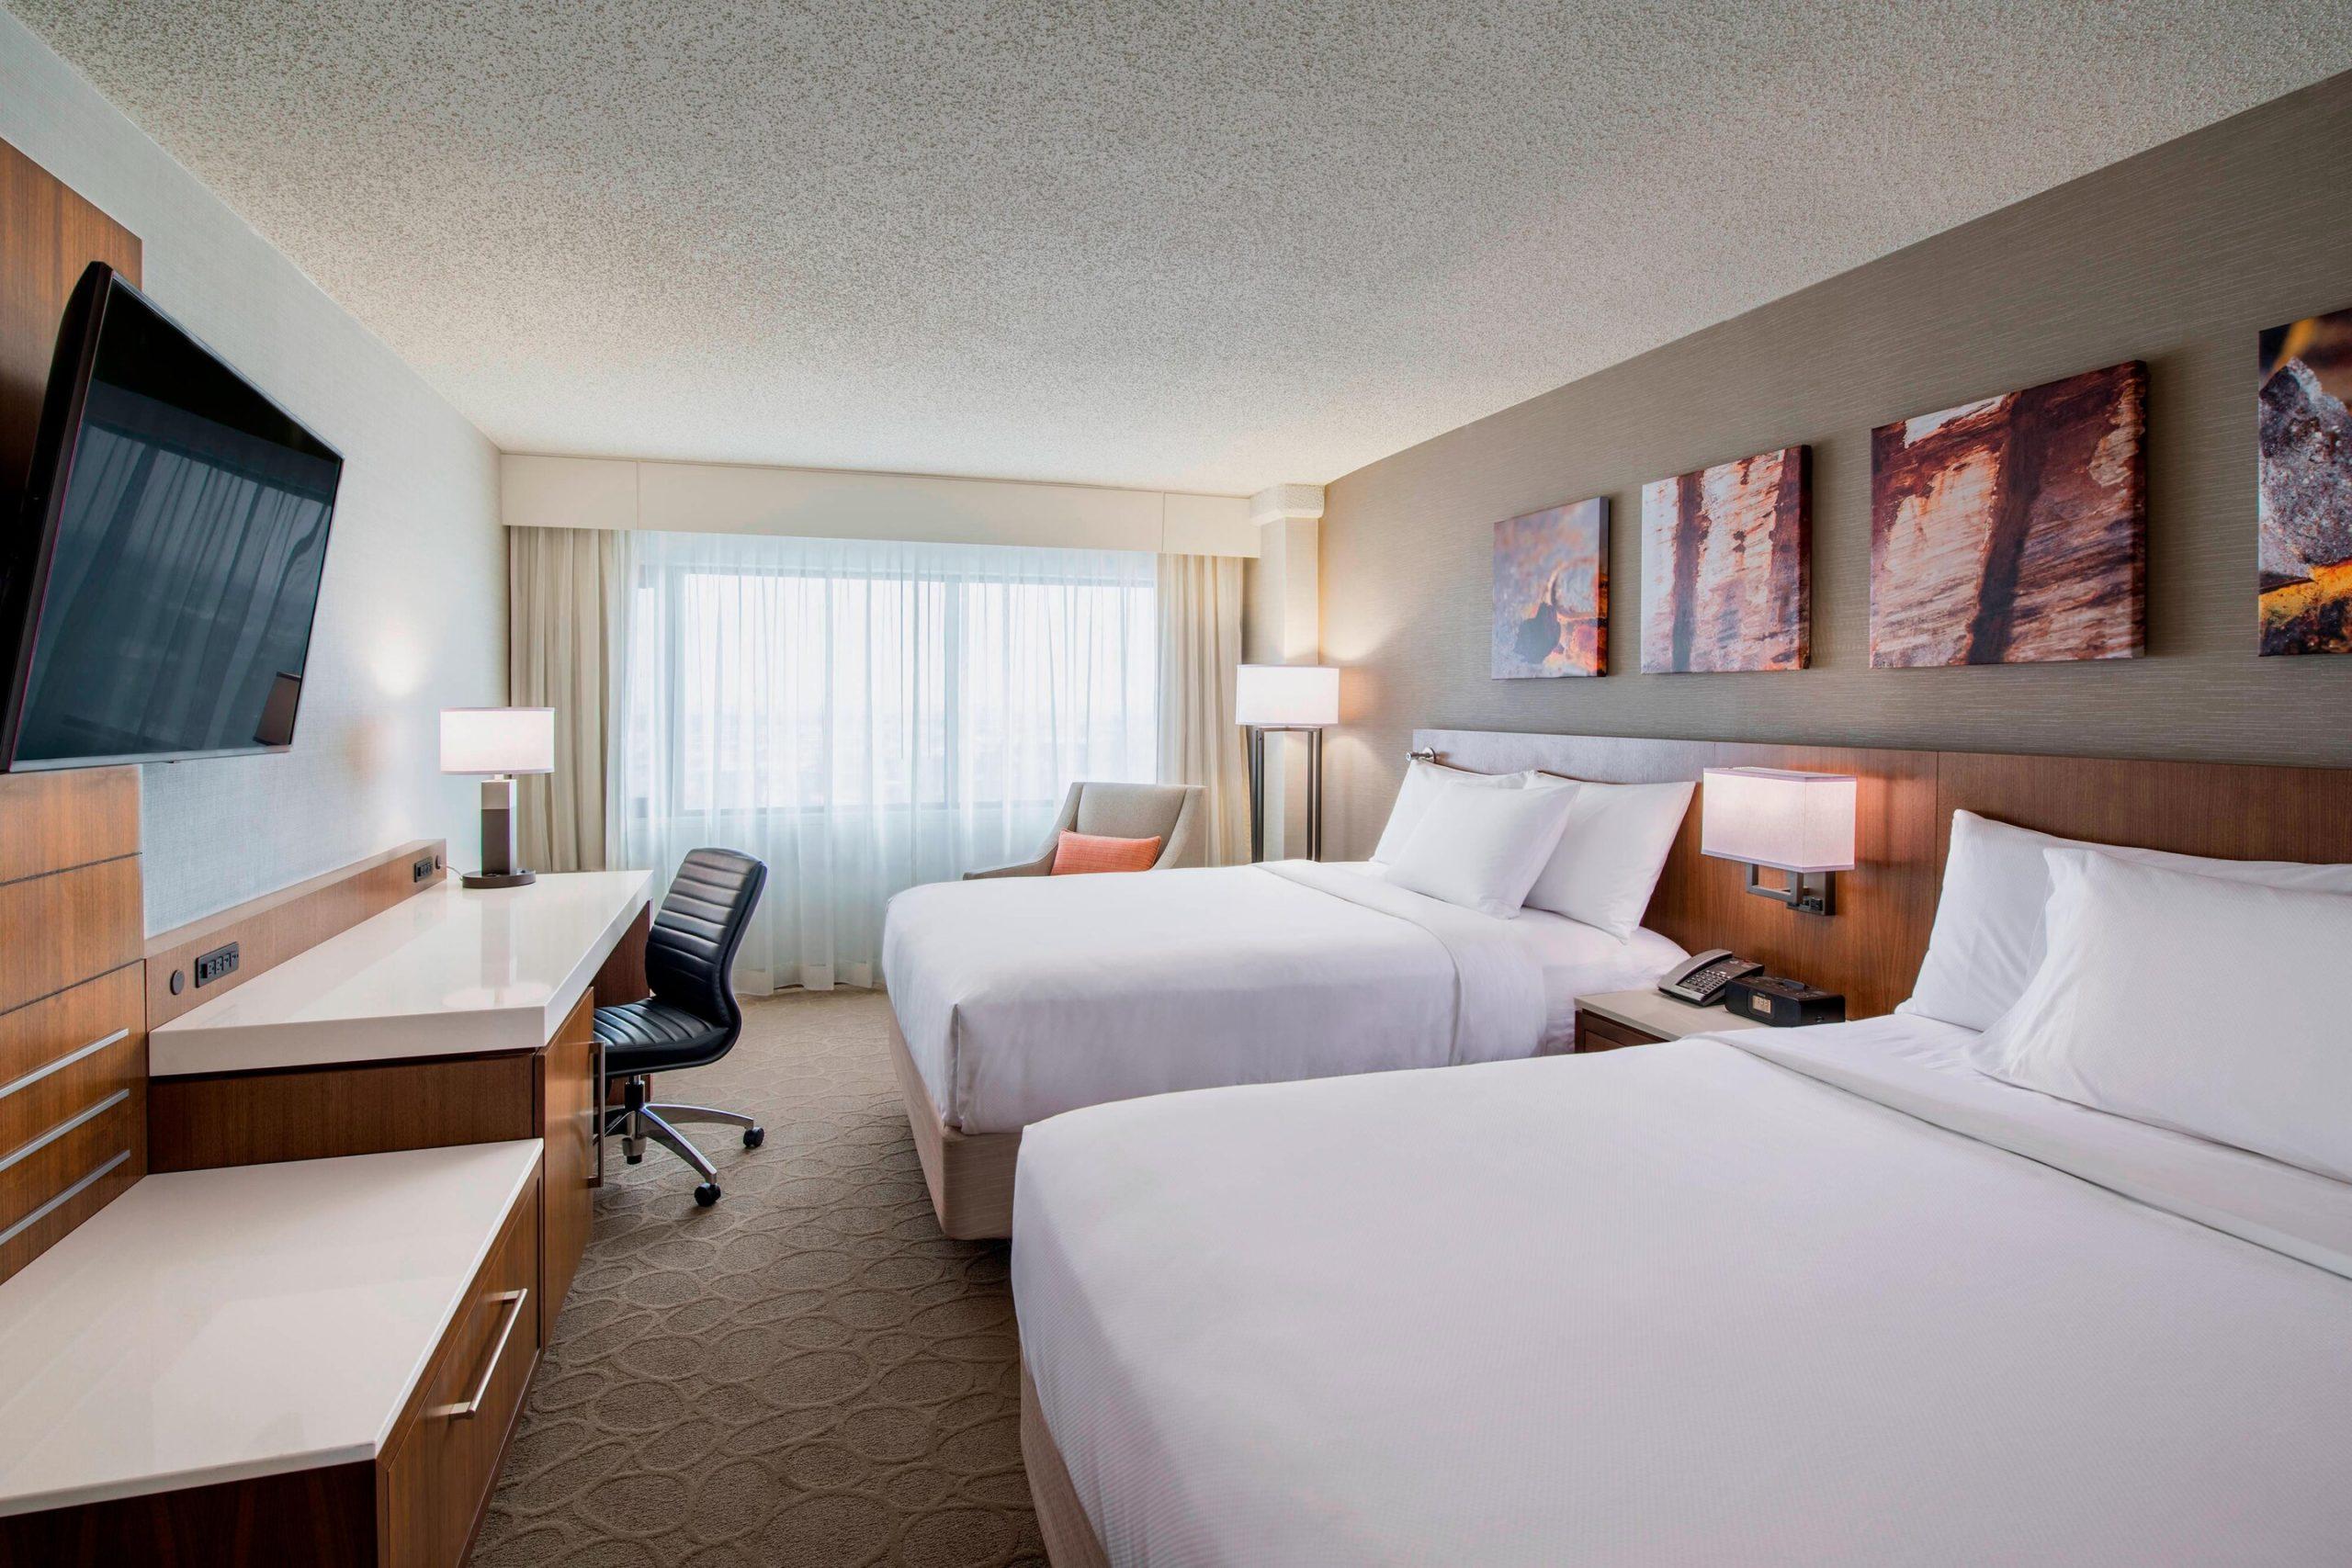 yqrdr-guestroom-4298-hor-clsc